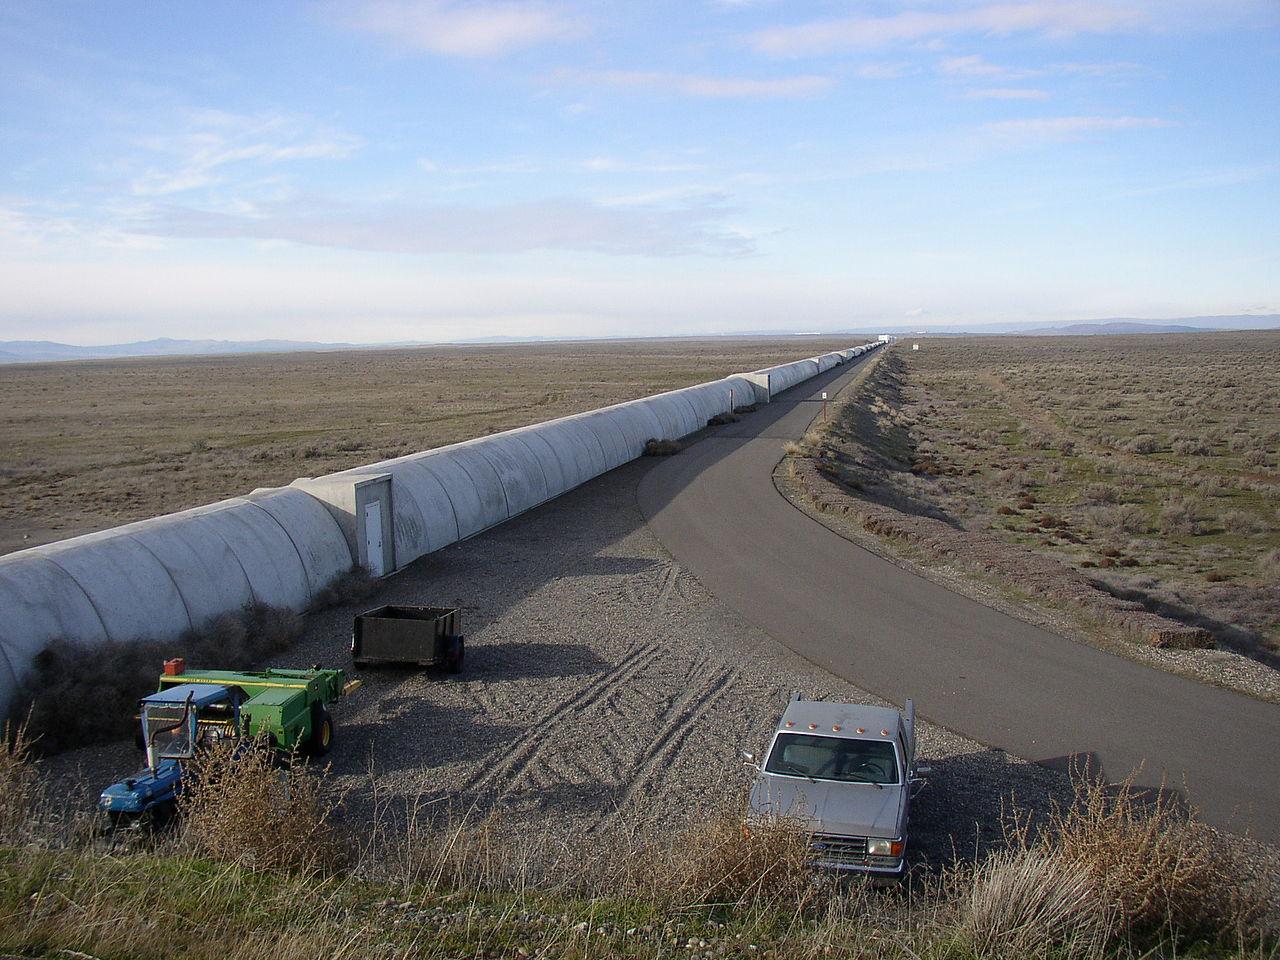 Northern leg (x-arm) of LIGO interferometer on Hanford Reservation - Image Credit:  Umptanum/WikimediaCommons